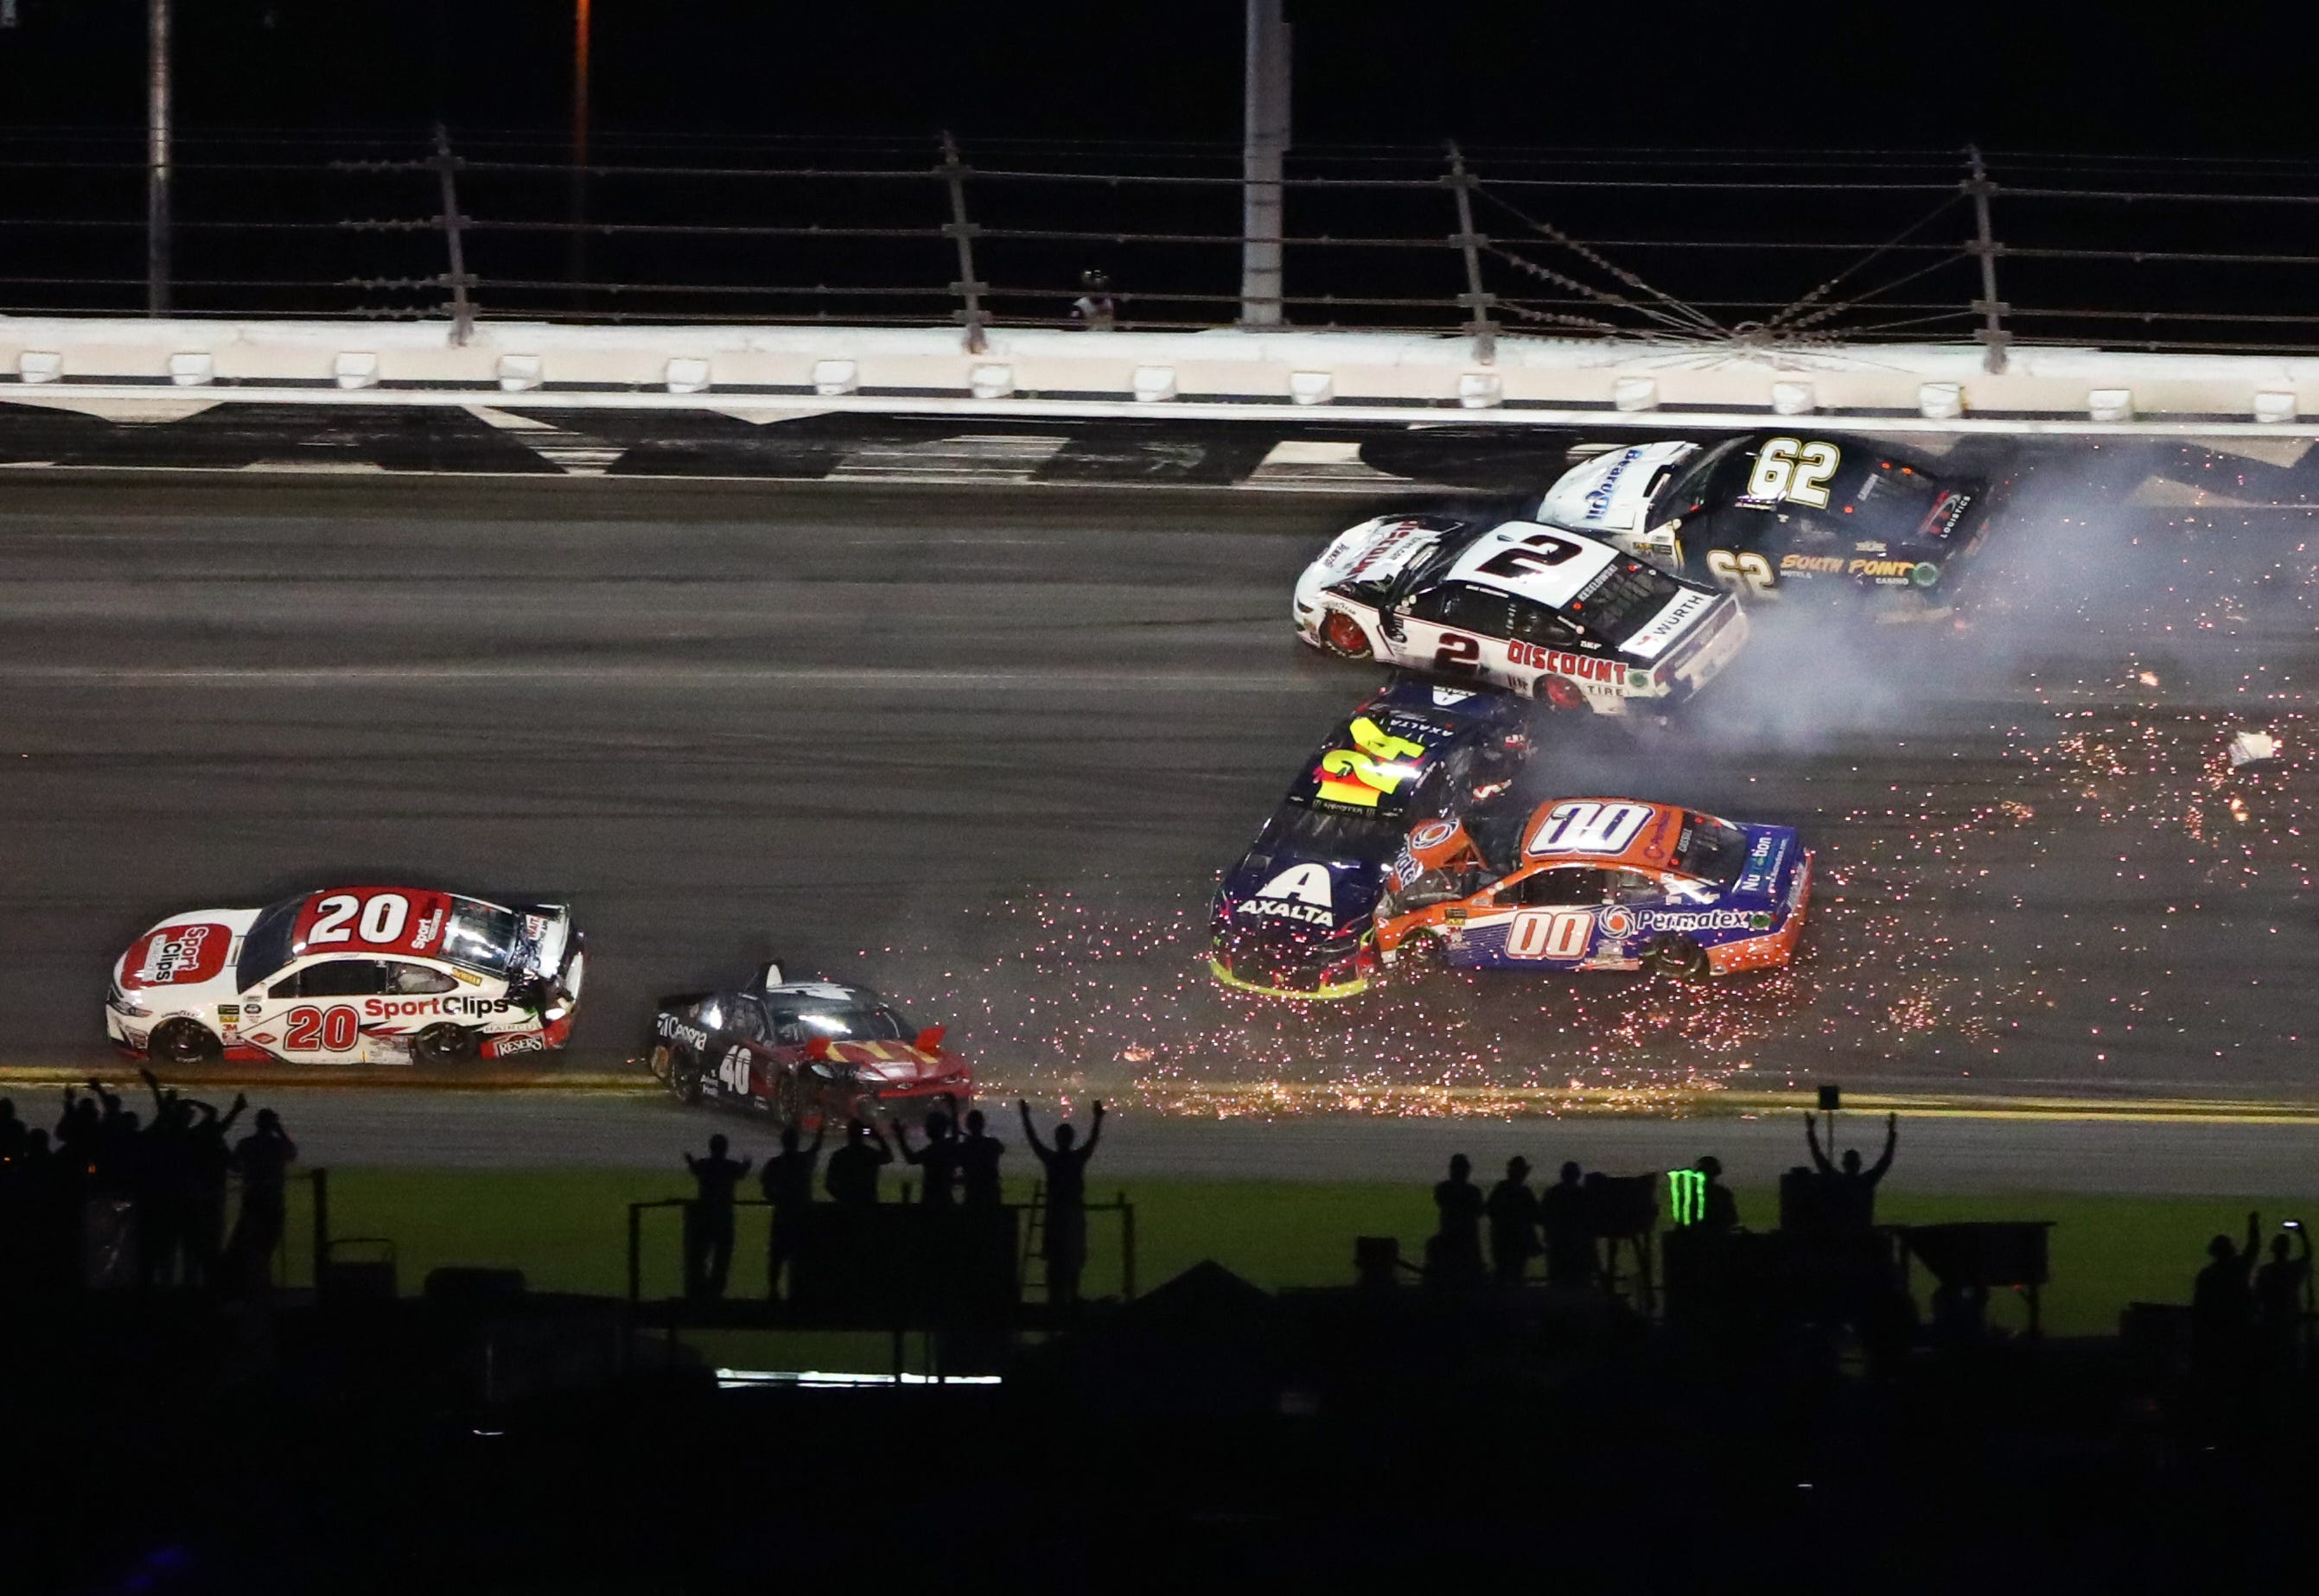 Wrecks cause late-race chaos, delays before Denny Hamlin wins Daytona 500 in OT